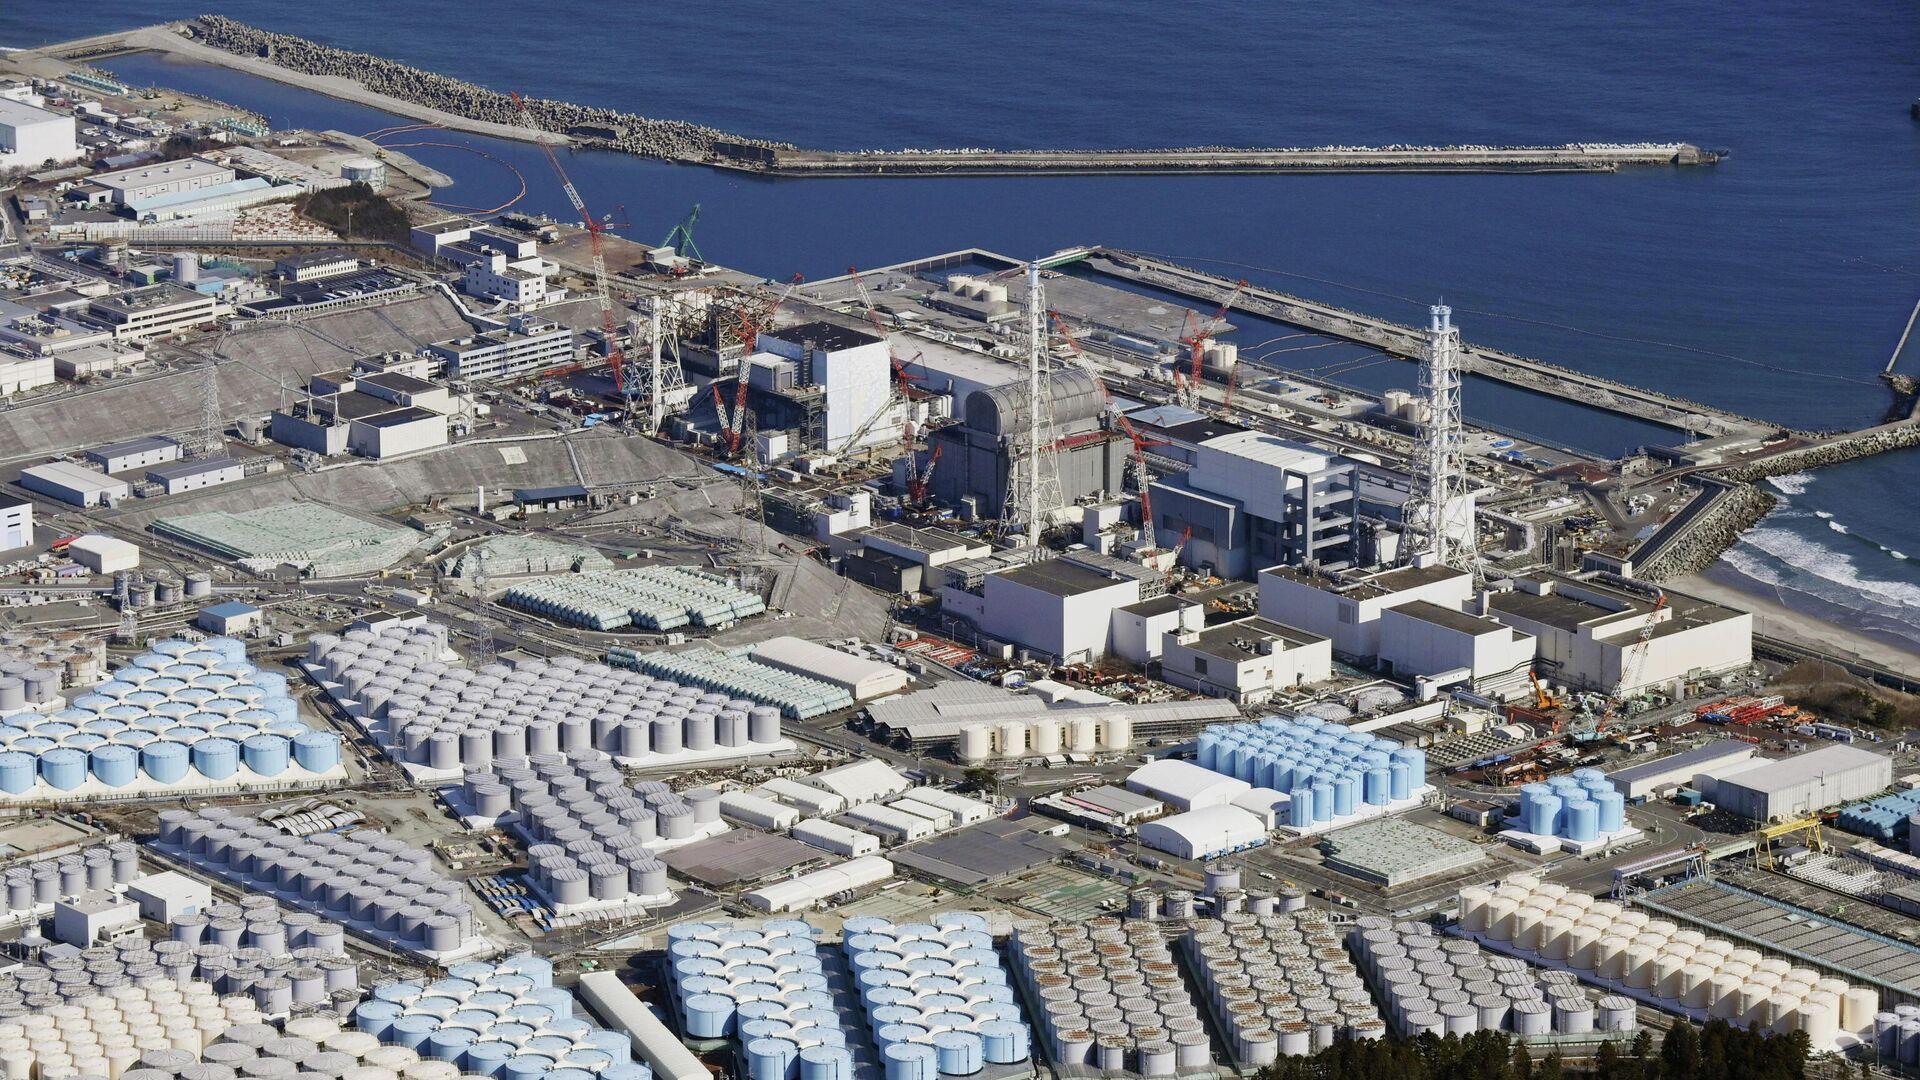 Behälter mit kontaminiertem Wasser im Kraftwerk Fukushima Daiichi, Okuma, Japan, der 13. Februar 2021 - SNA, 1920, 14.04.2021